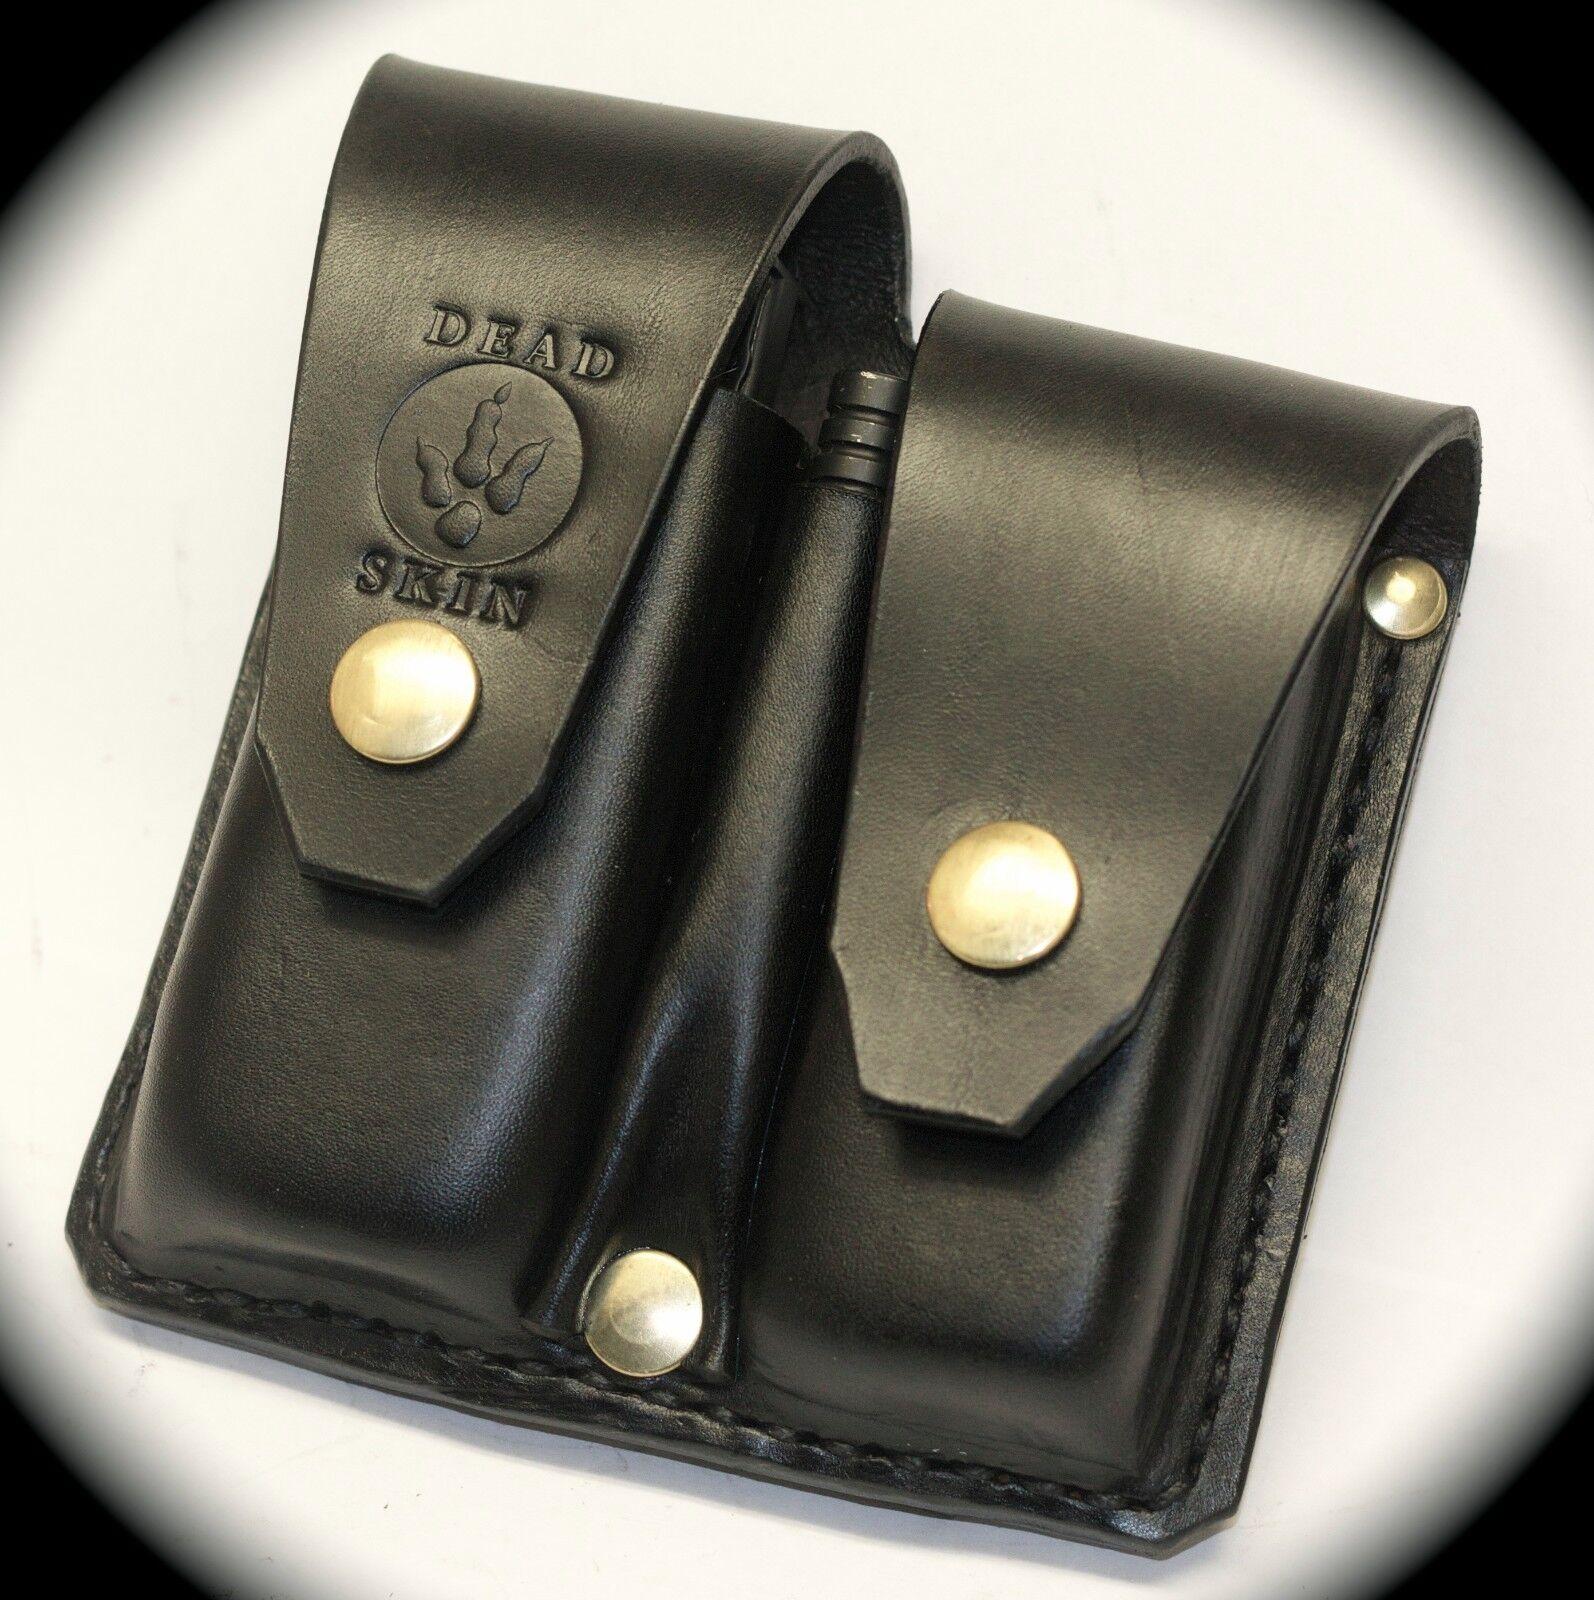 Leather sheath-For leatherman SURGE+ bit  kit &  bit  extender handmade AU maker  reasonable price